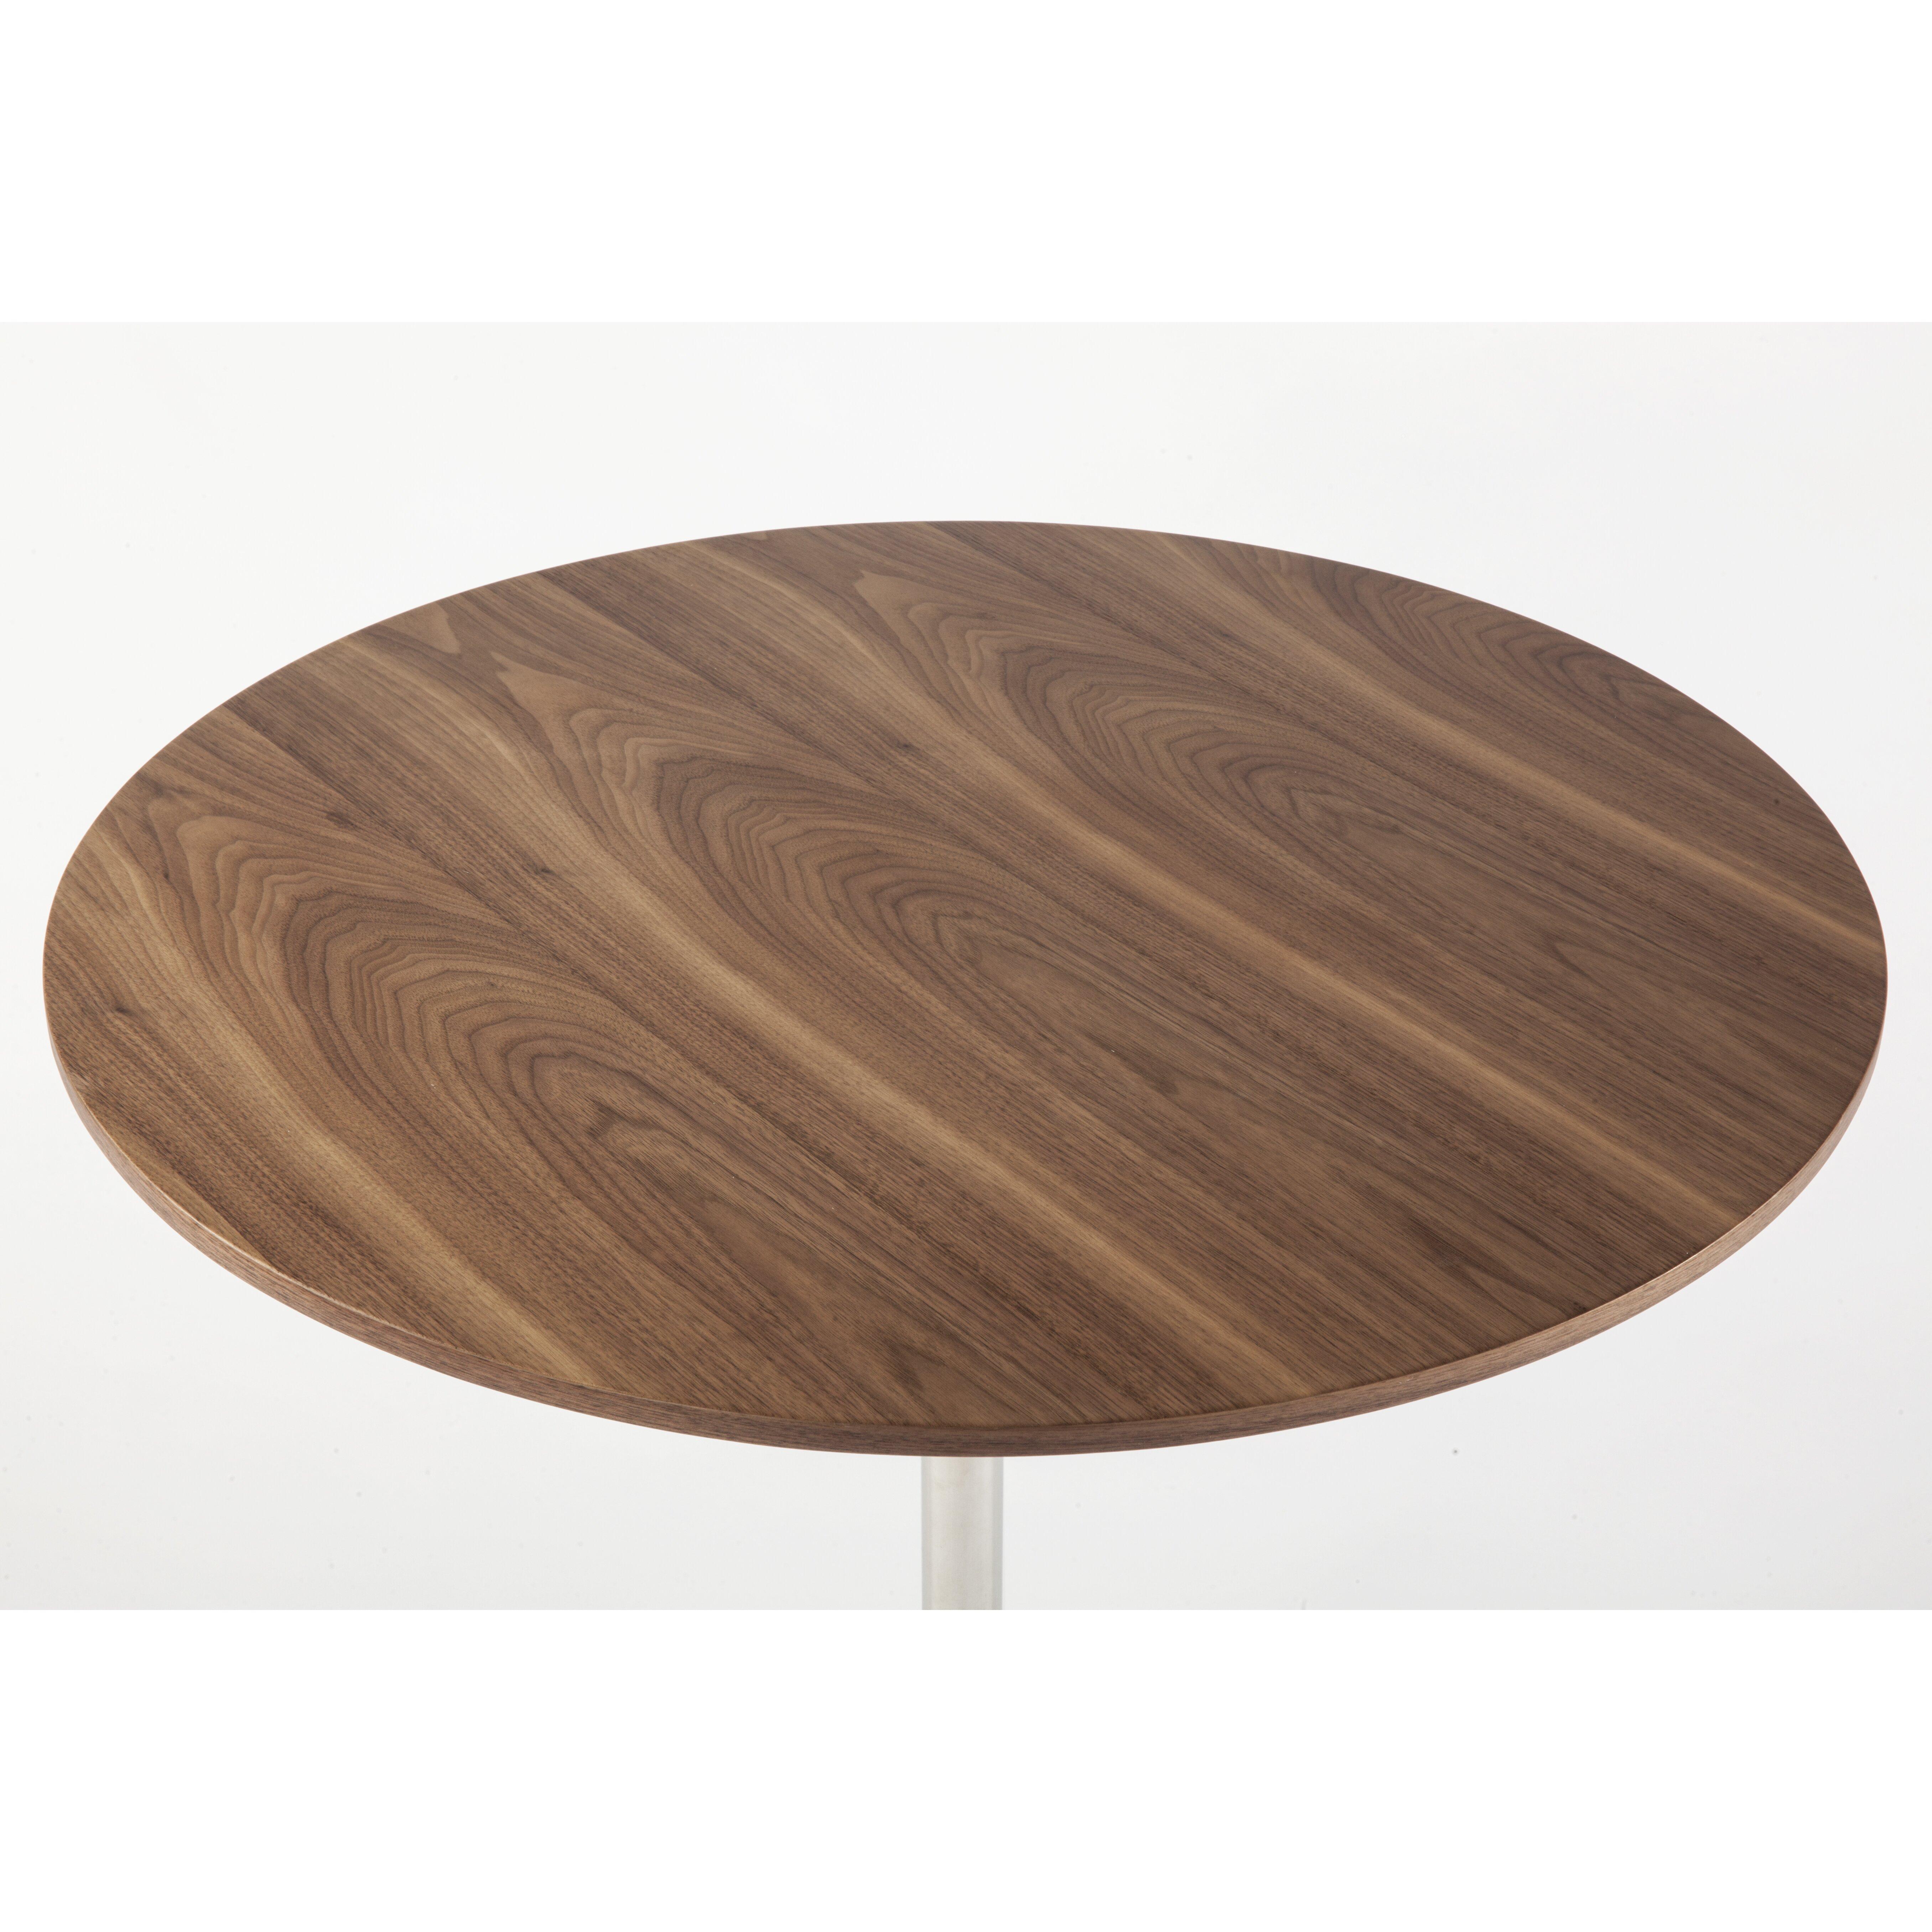 dCOR design Heerlen Dining Table amp Reviews Wayfair : dCOR design Heerlen Dining Table from www.wayfair.com size 5424 x 5424 jpeg 2996kB